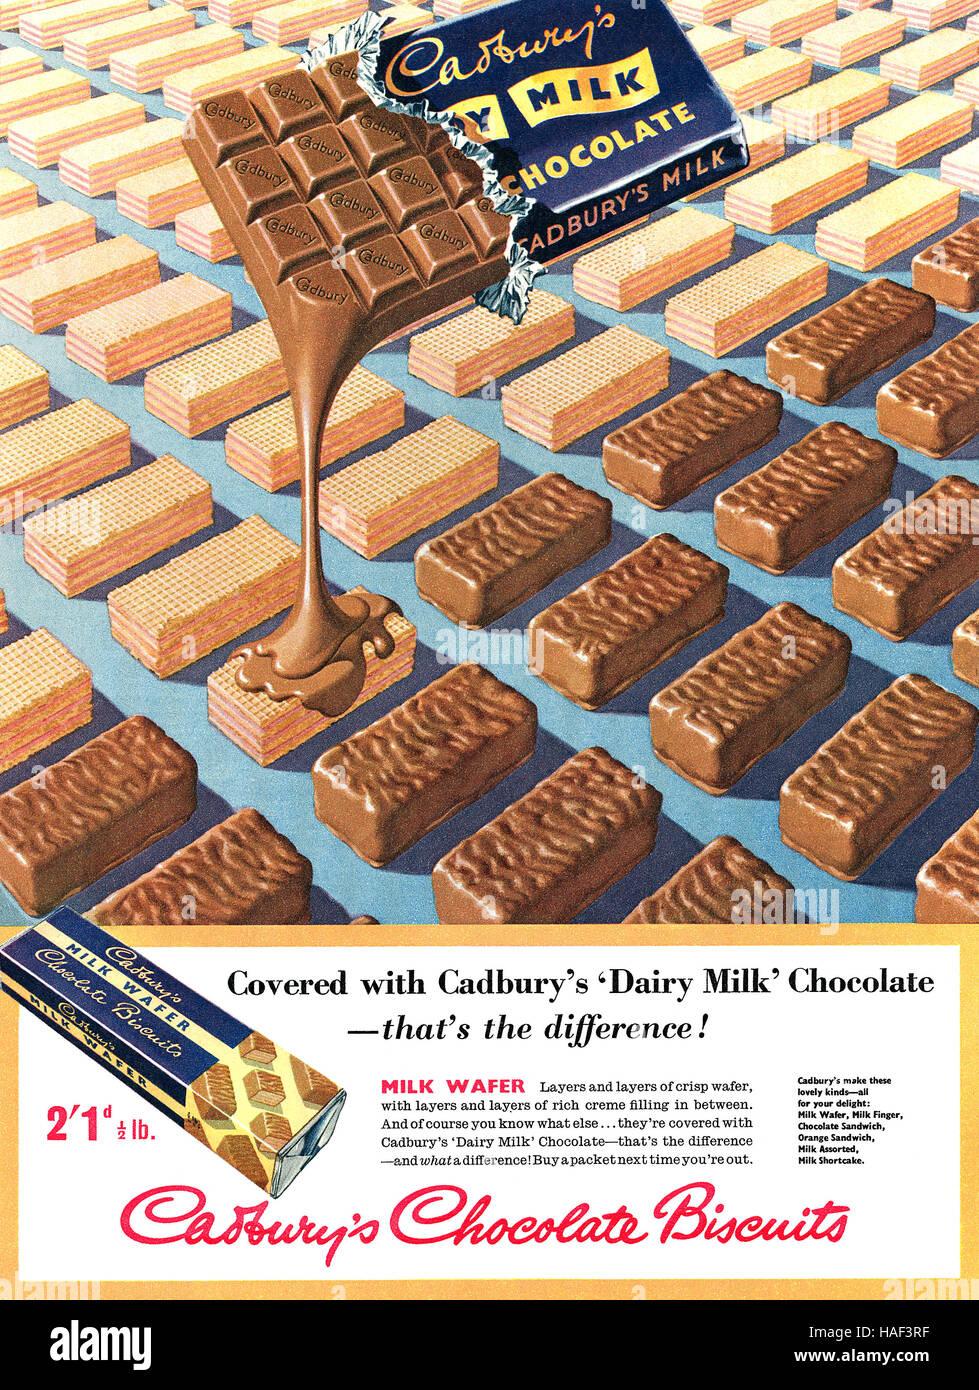 Magazine Advert Chocolate Stock Photos & Magazine Advert Chocolate ...